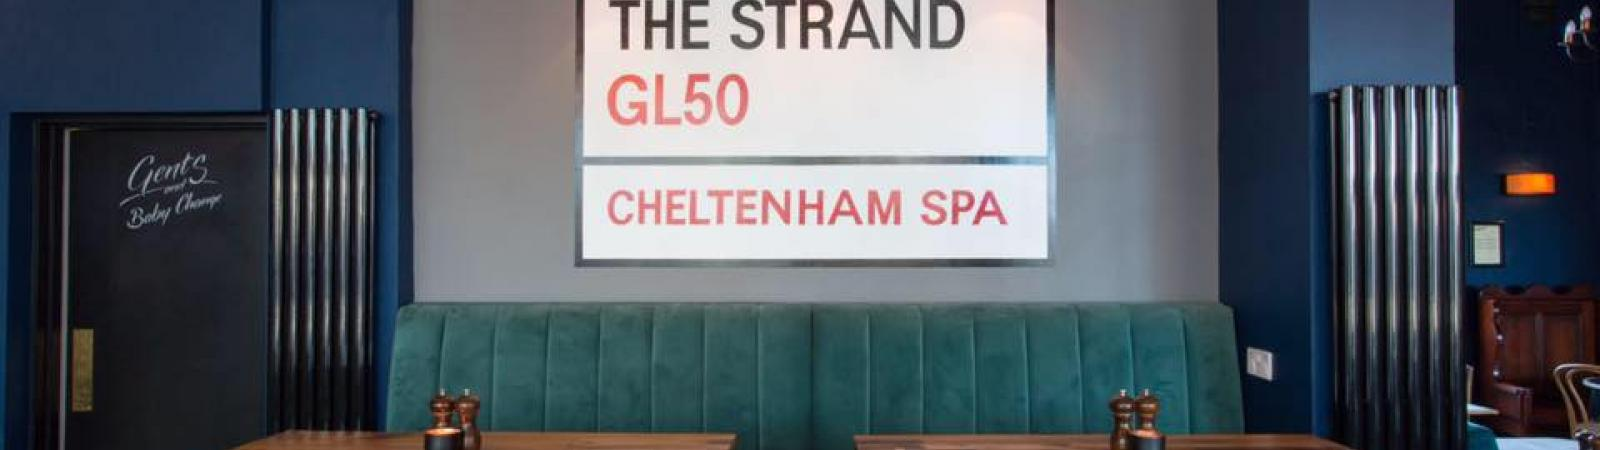 Strand Bar on Cheltenham Night Out